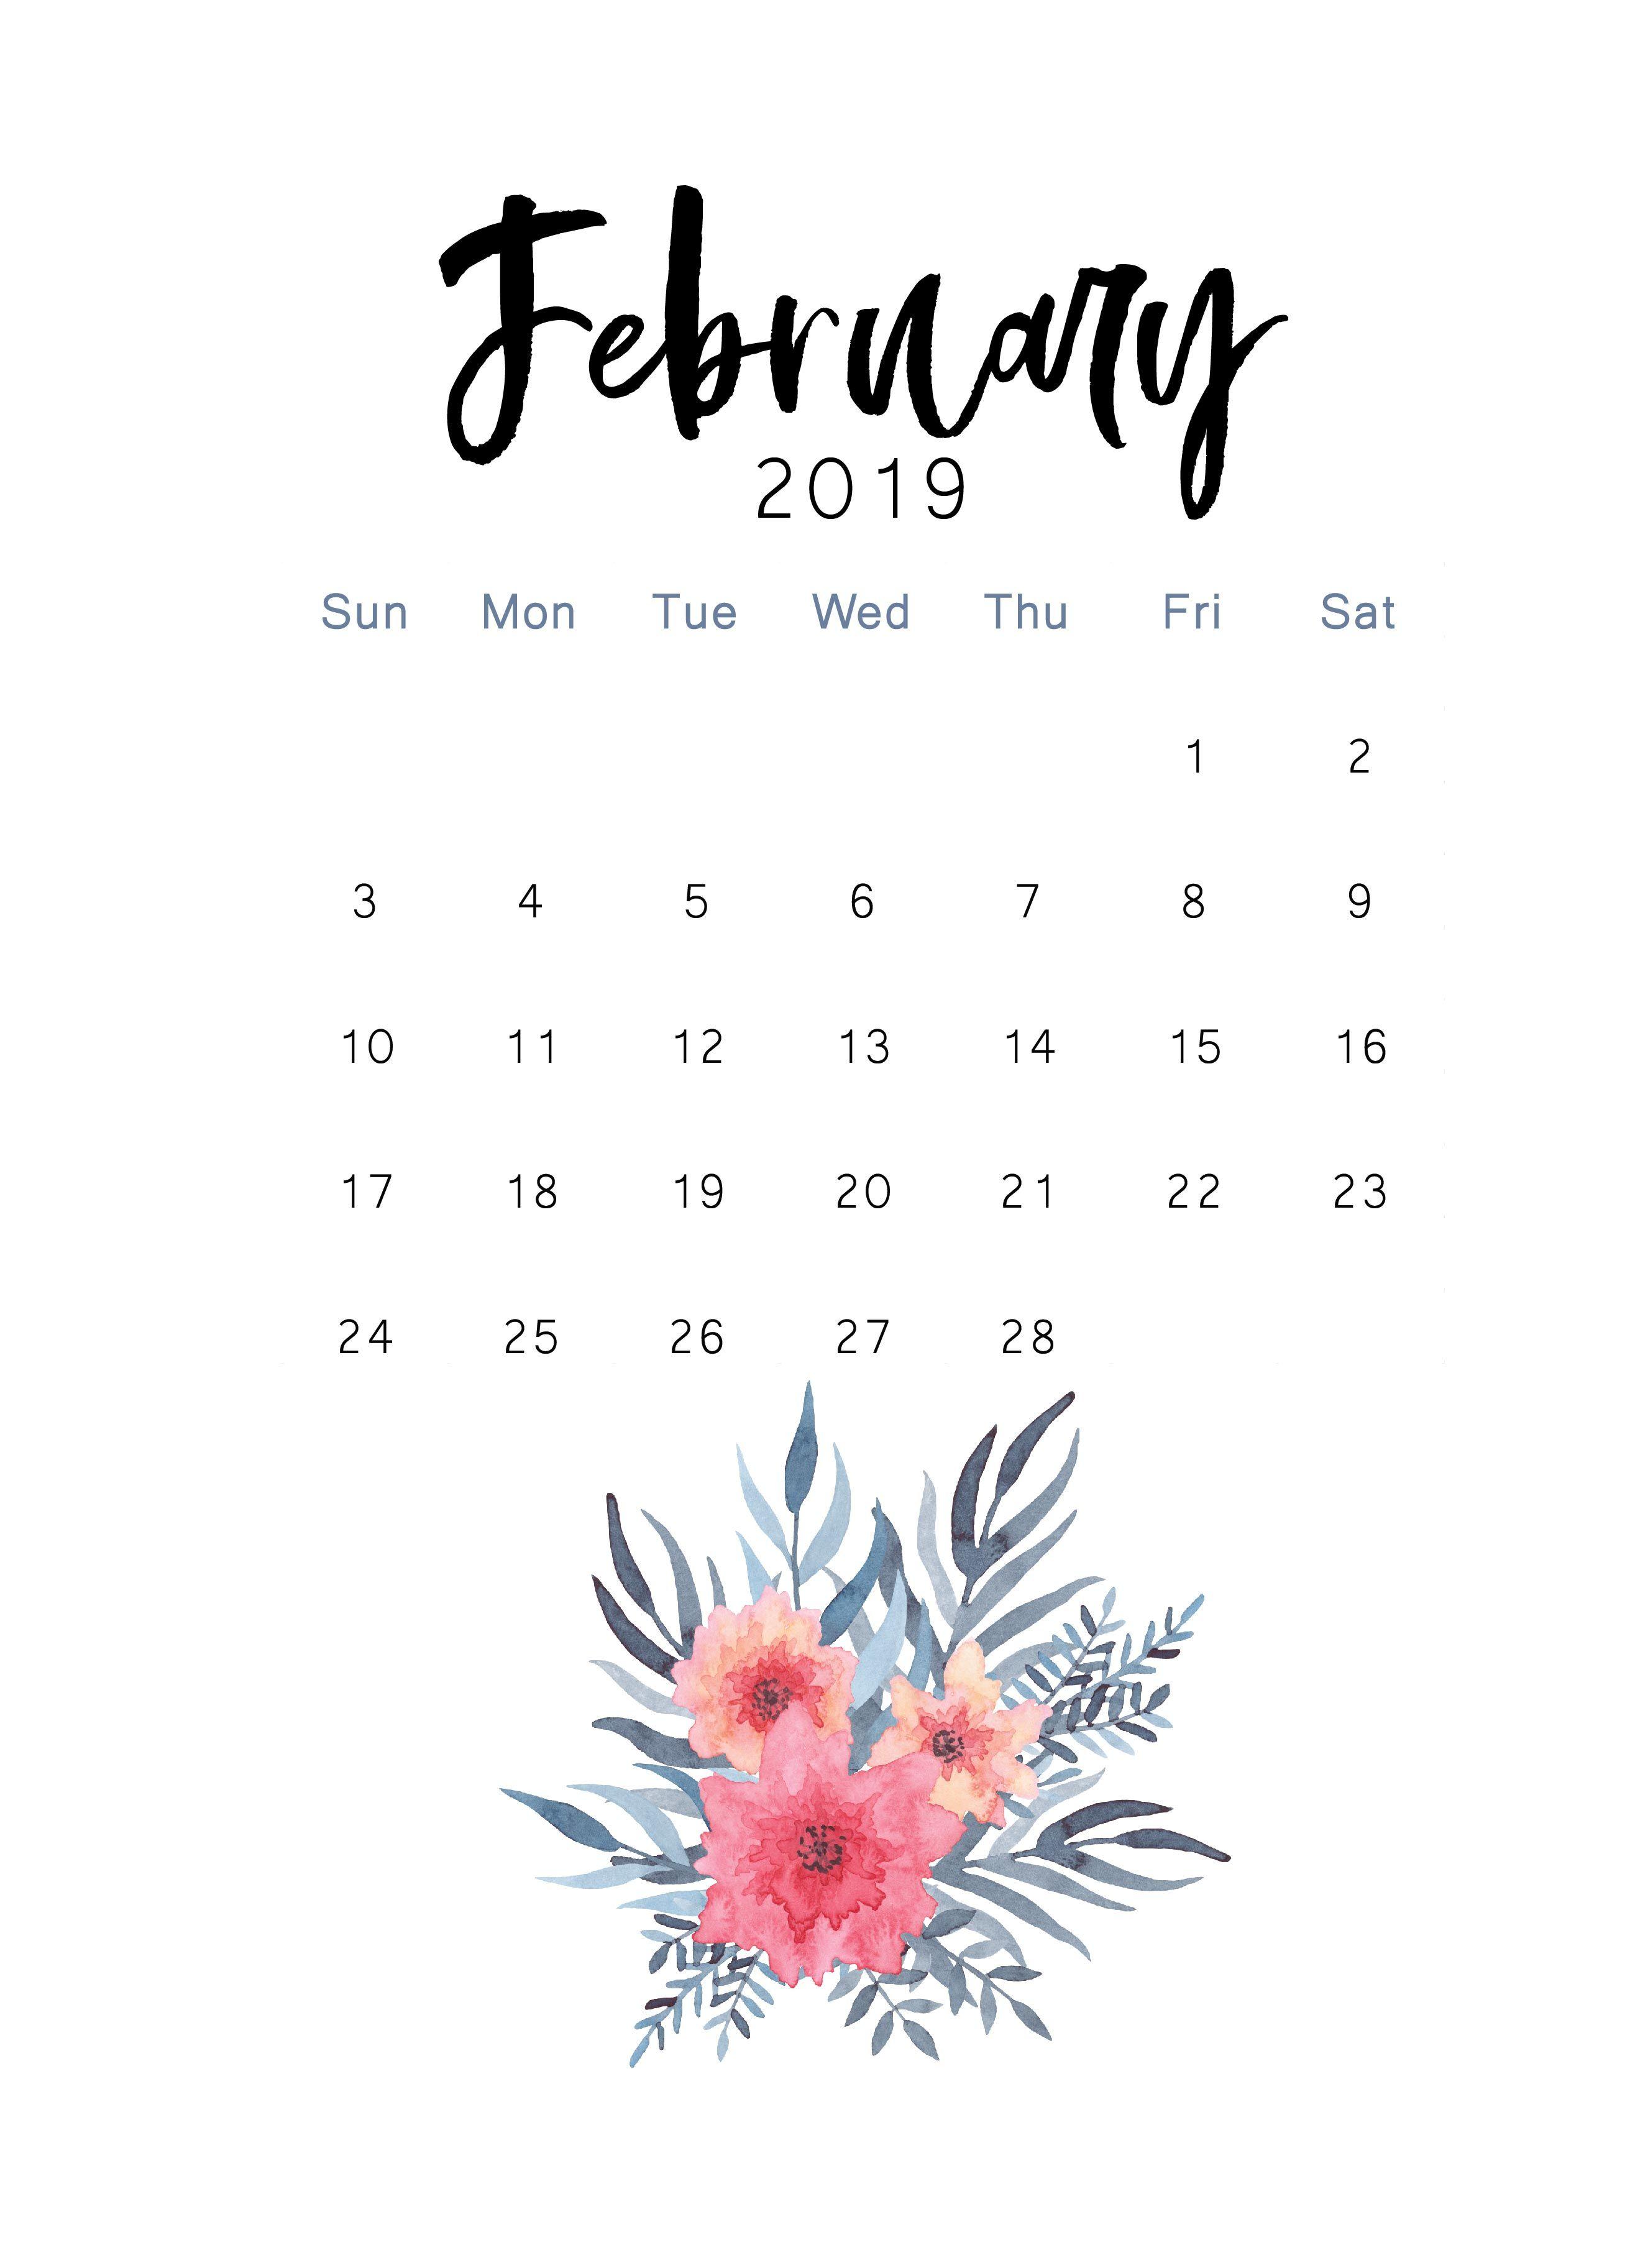 February 2019 printable calendar | The Cactus Creative ...